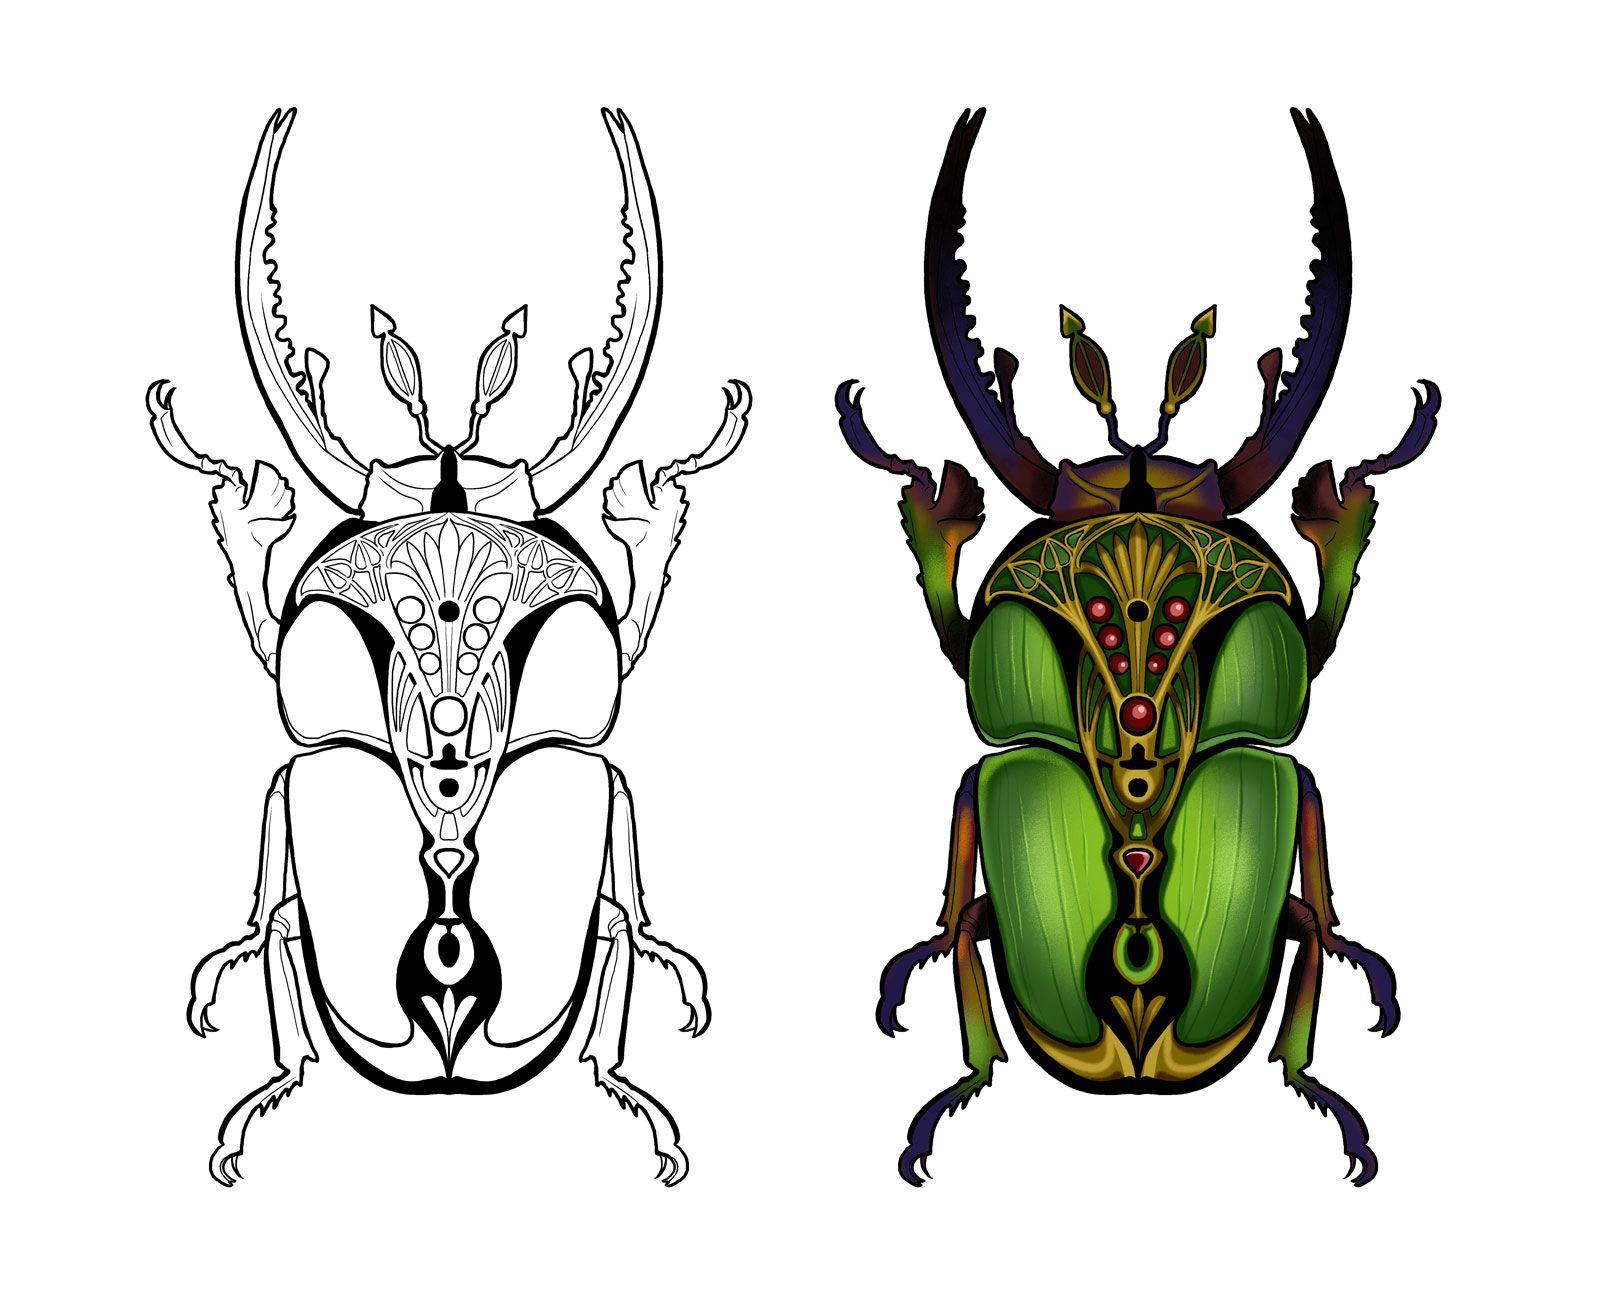 1600x1307 Cool Bug Drawings Draw Barcelona Corel Cricket Cartoon Big Chungus